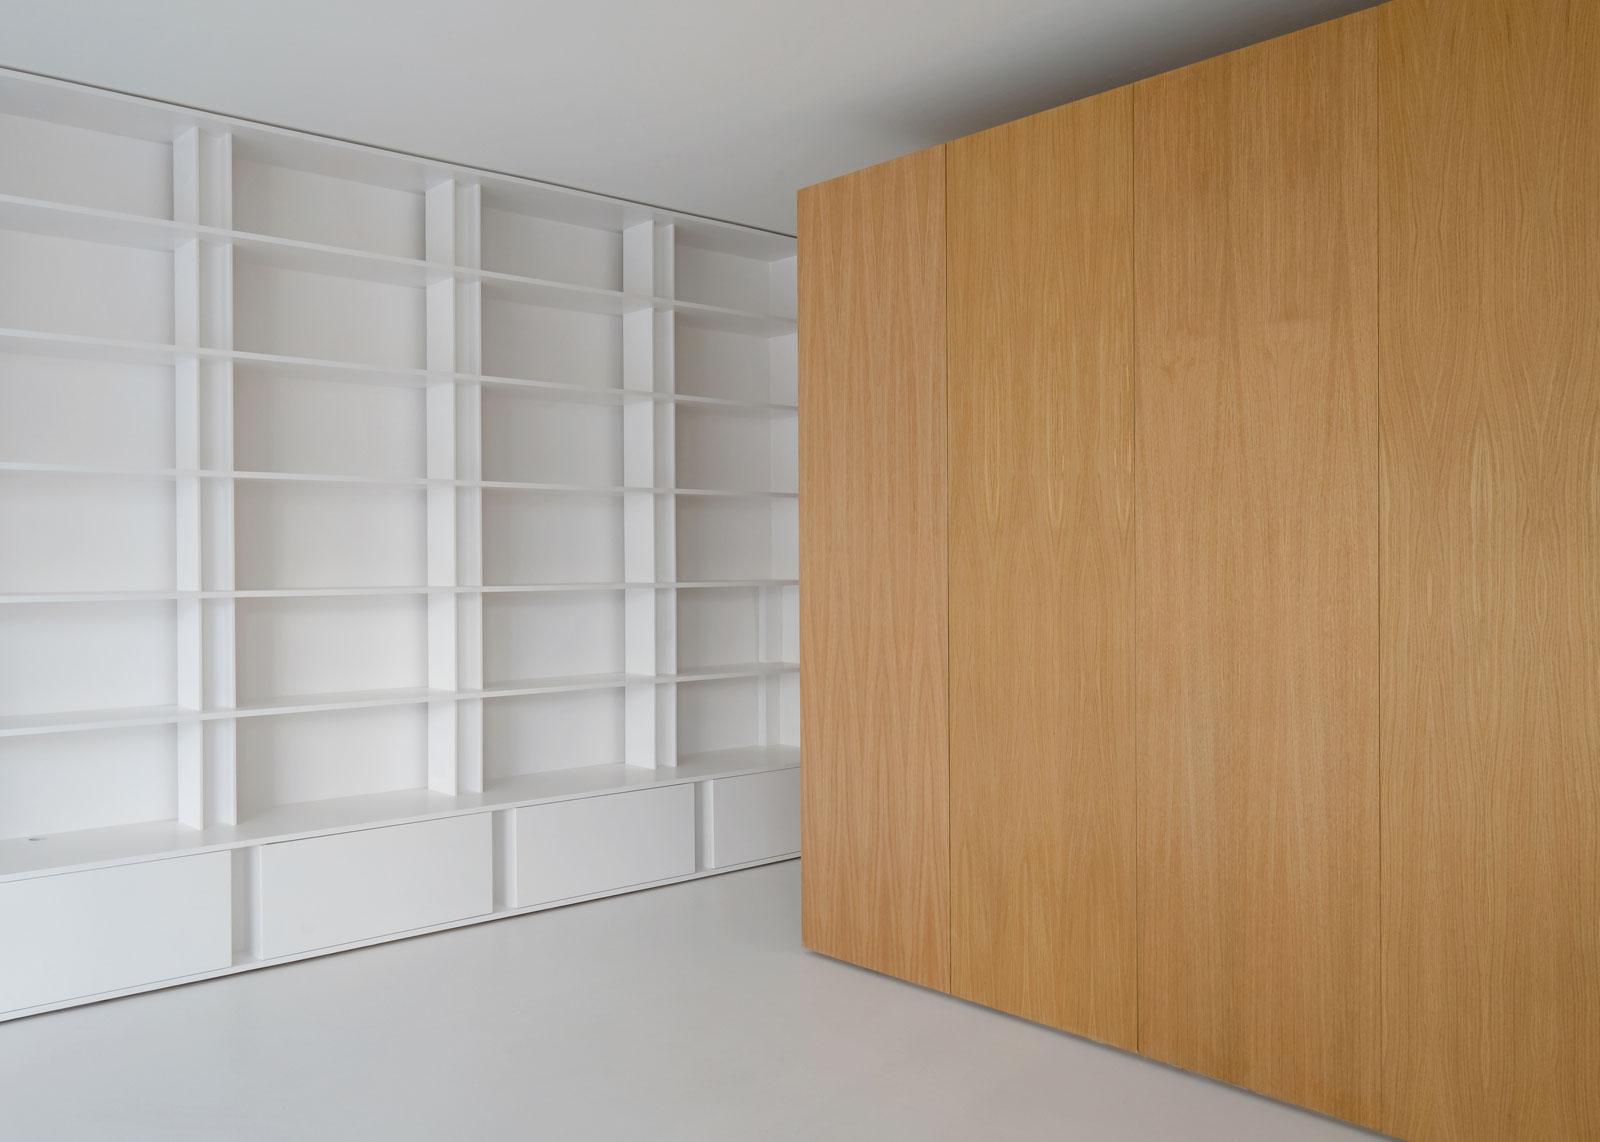 appartement S - heros architecture appartement S meuble bois